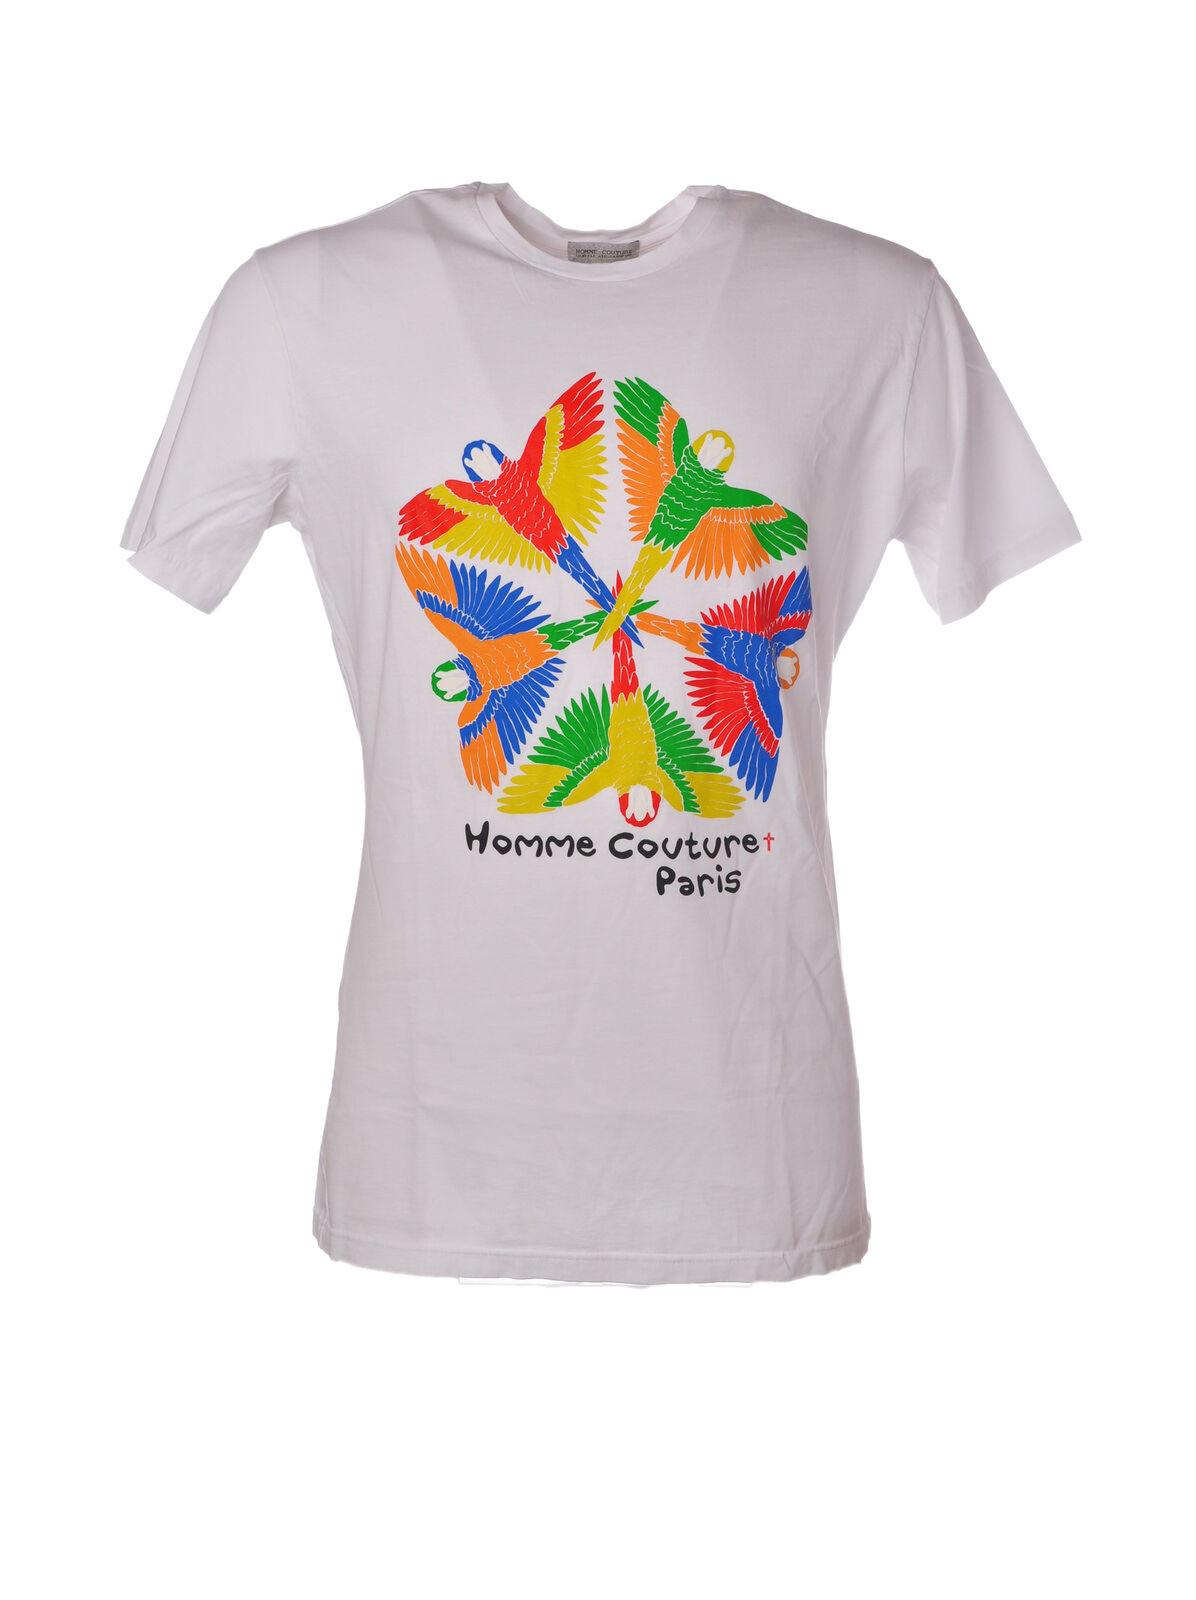 Daniele Alessandrini - Topwear-T-shirts - Man - White - 5052412F183800